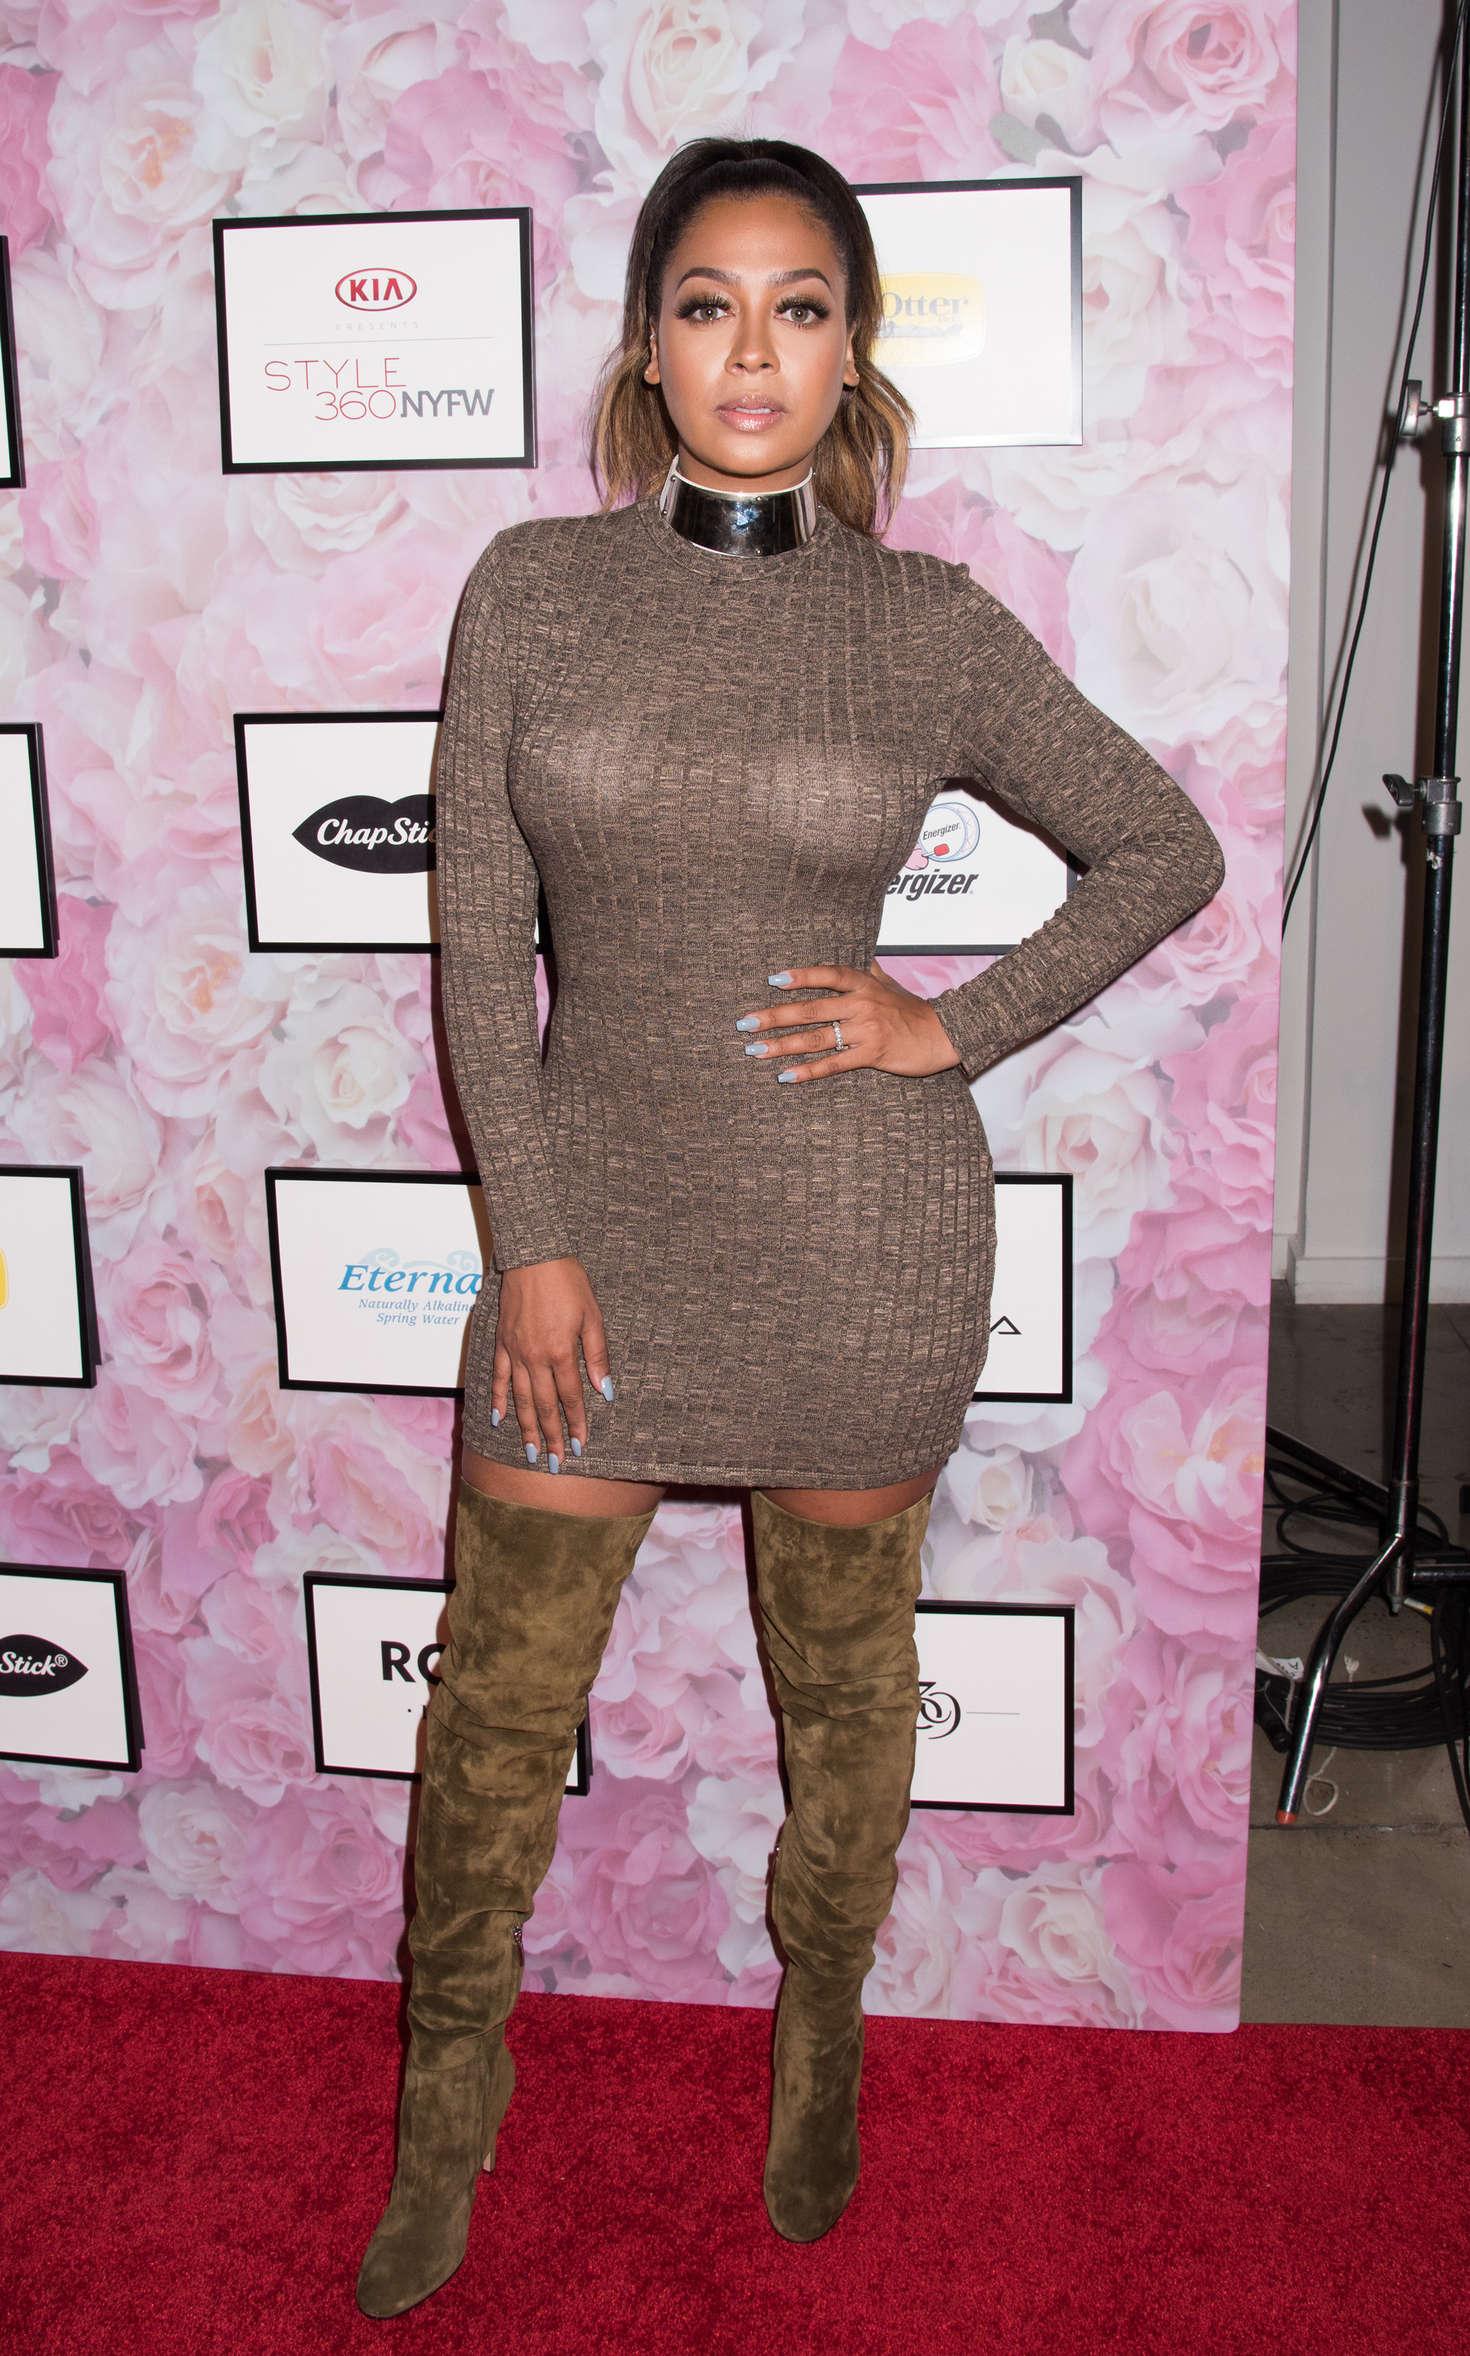 La La Anthony Hsn Presents Serena Williams Signature Statement Collection Fashion Show 2016 In Ny